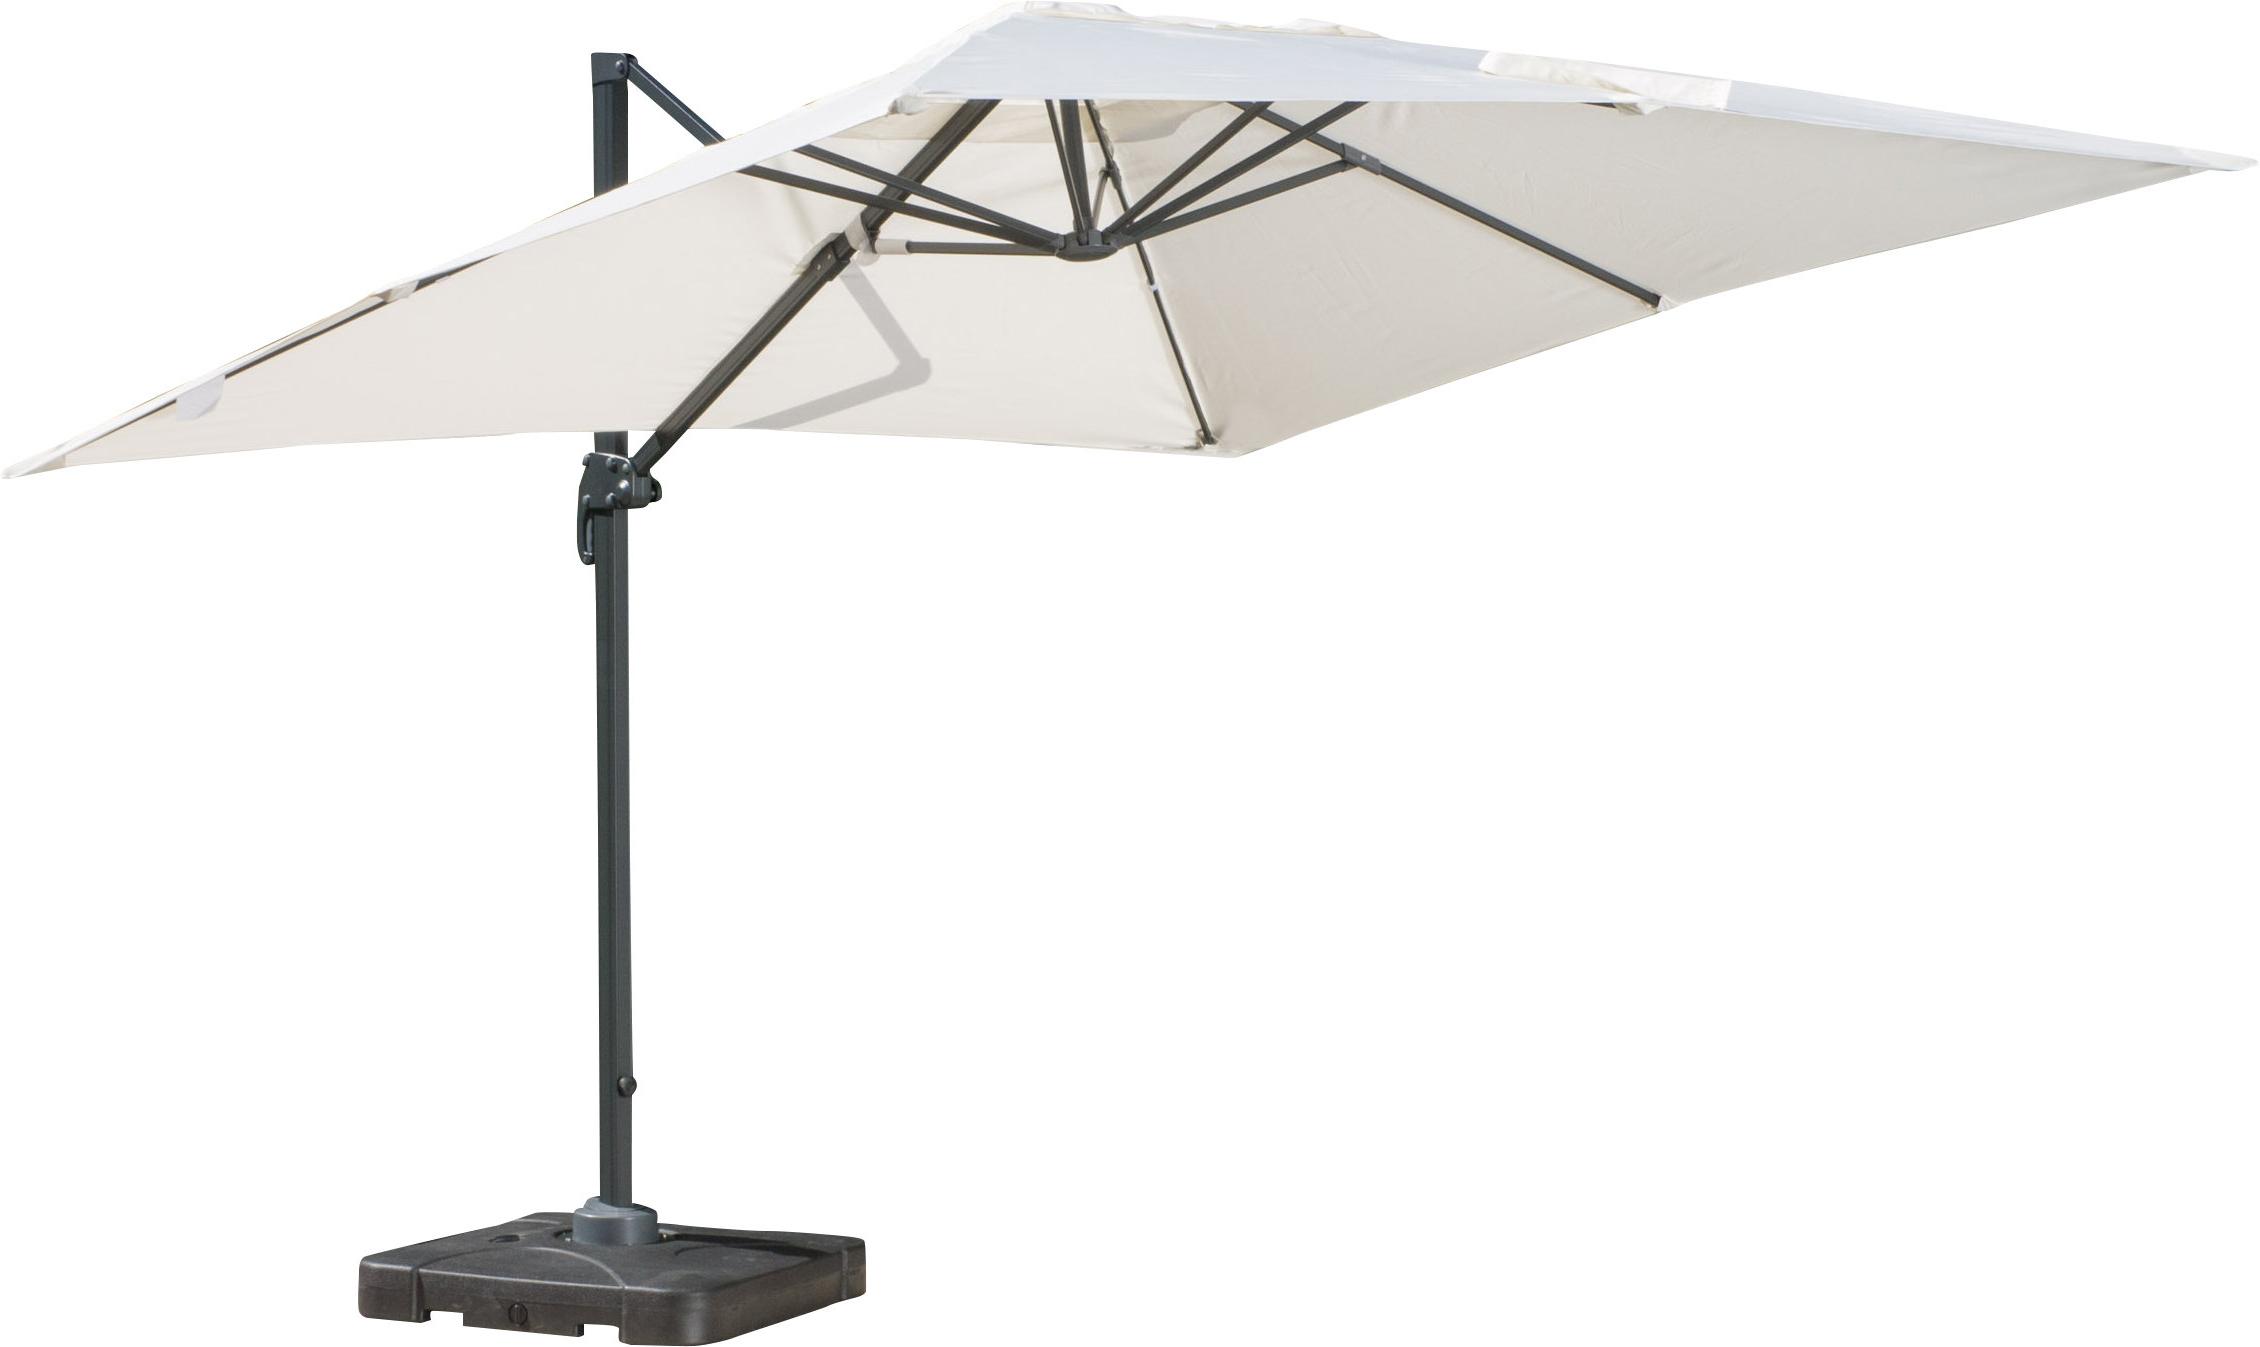 Boracay 10' Square Cantilever Umbrella & Reviews (Gallery 12 of 20)